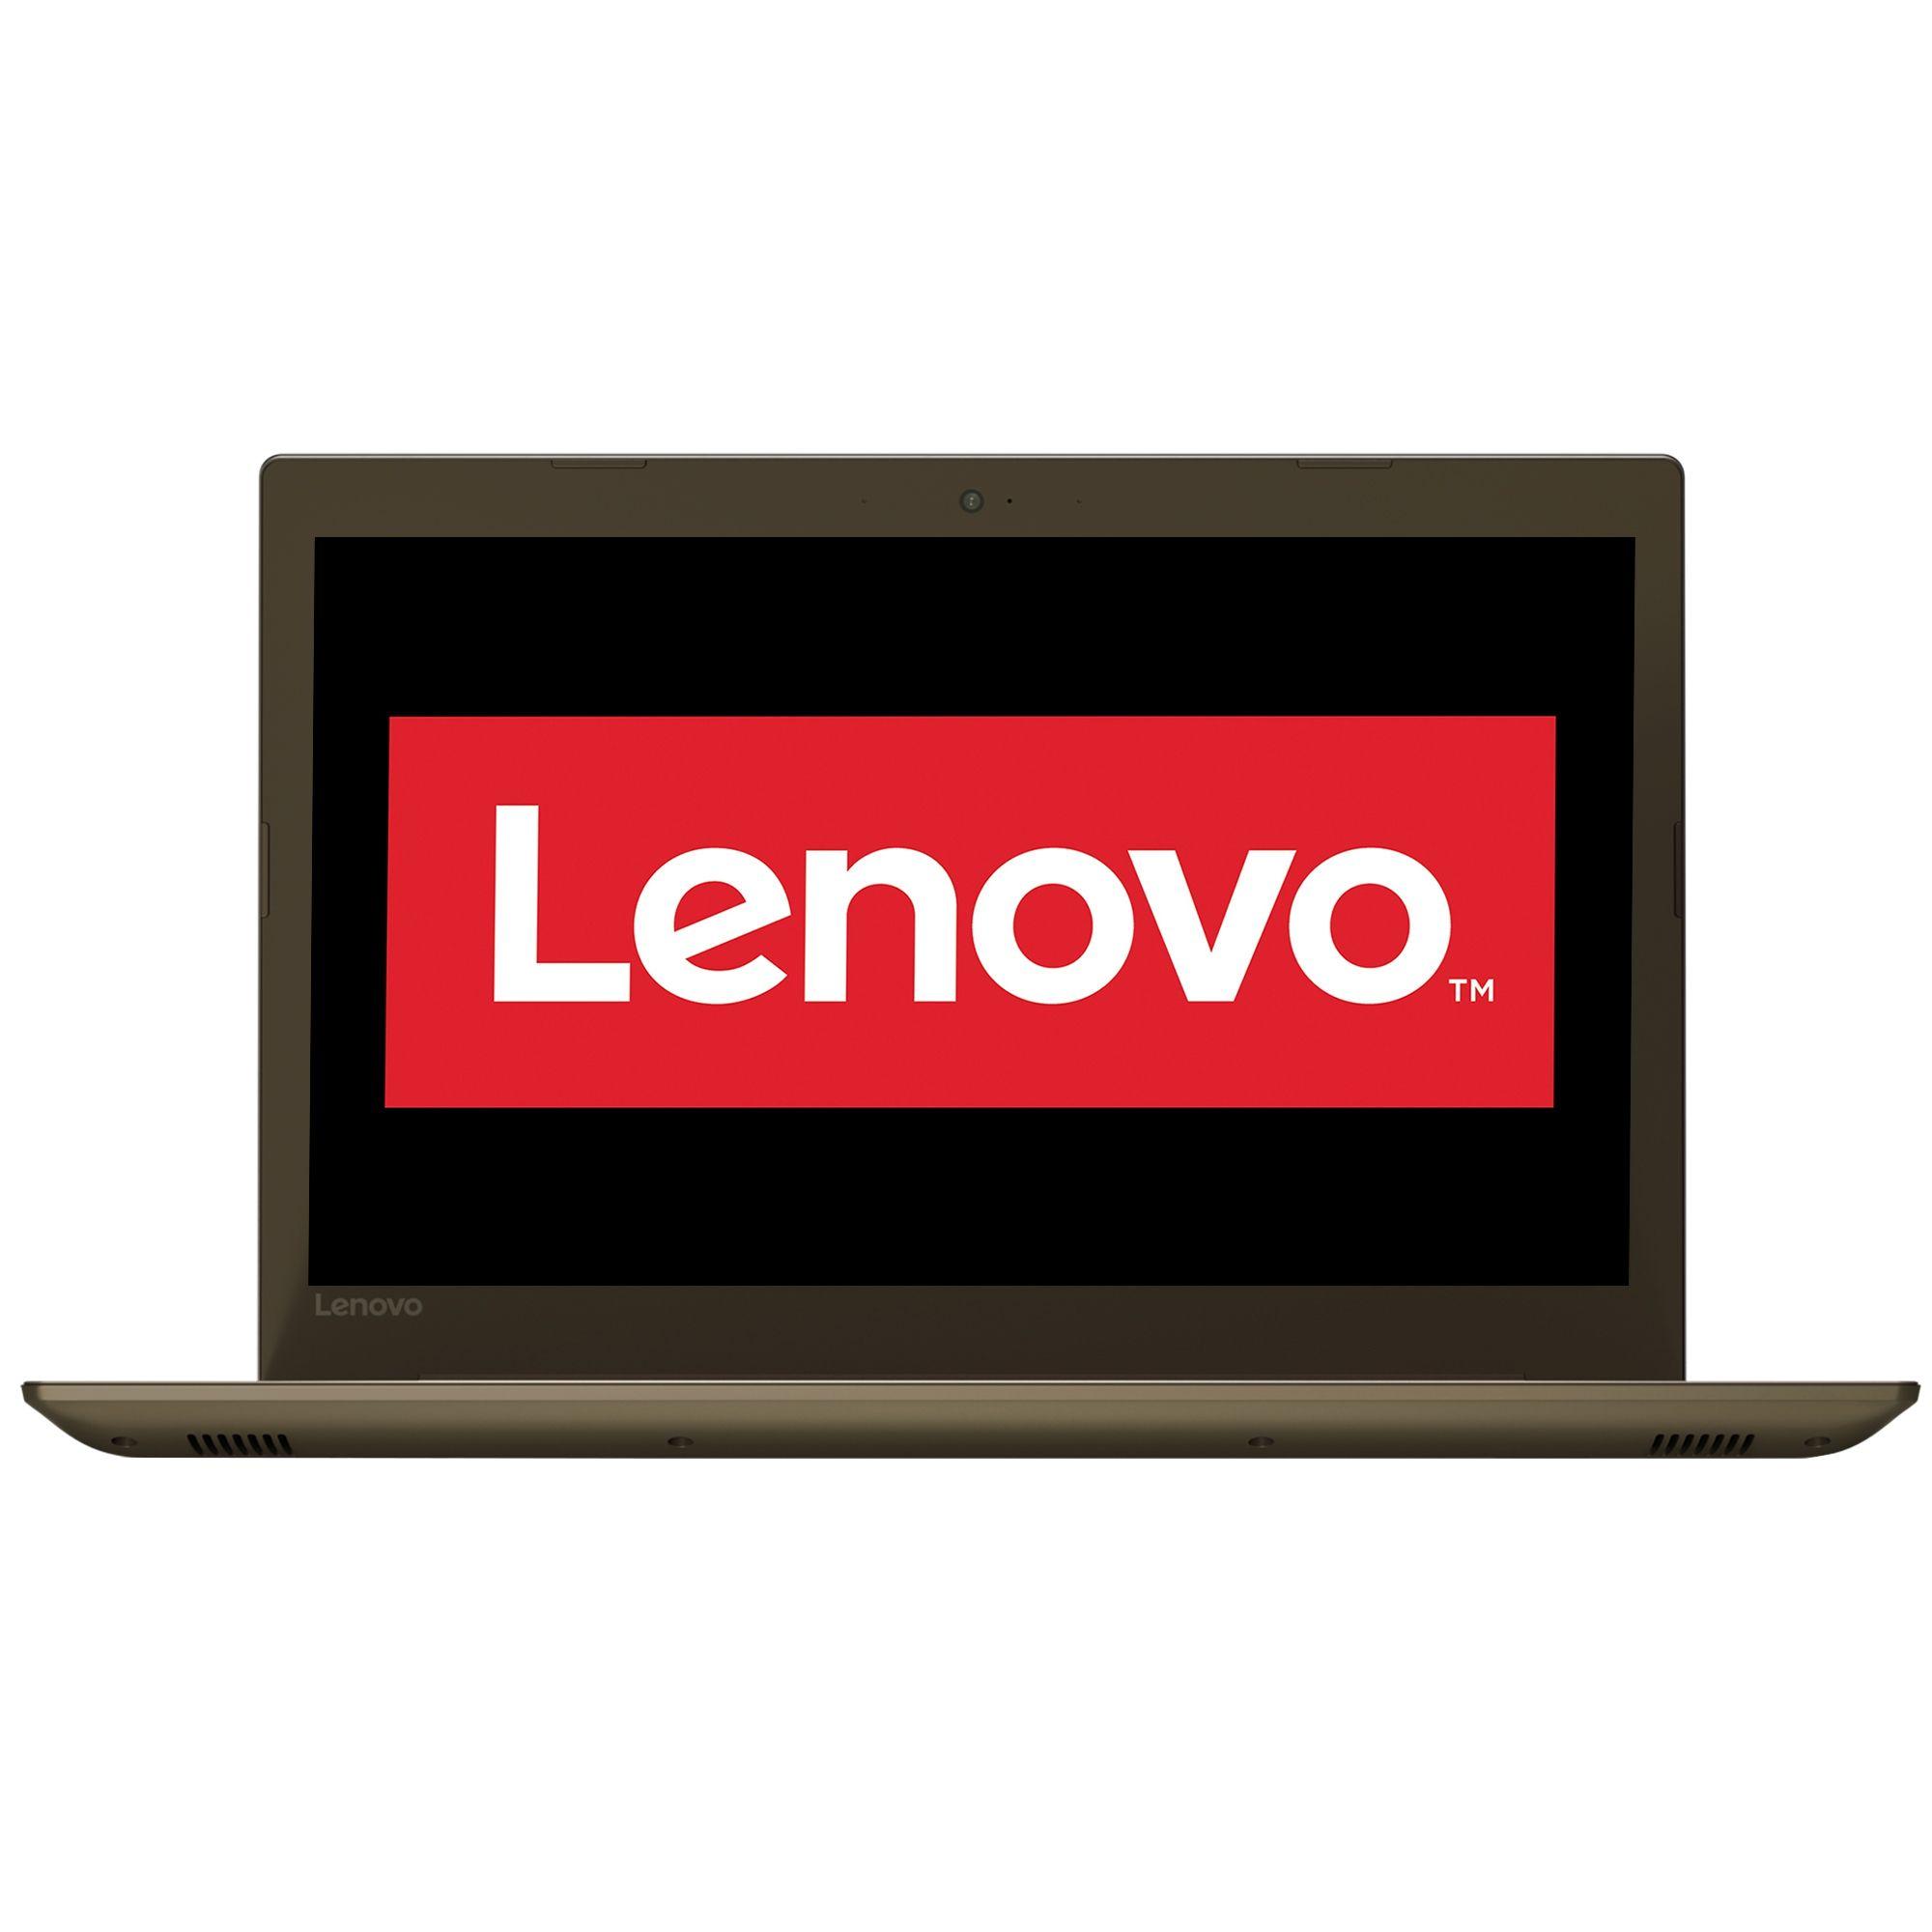 Notebook Lenovo IdeaPad 520S 14 Full HD Intel Core i7-8550U RAM 8GB SSD 256GB FreeDOS Bronz